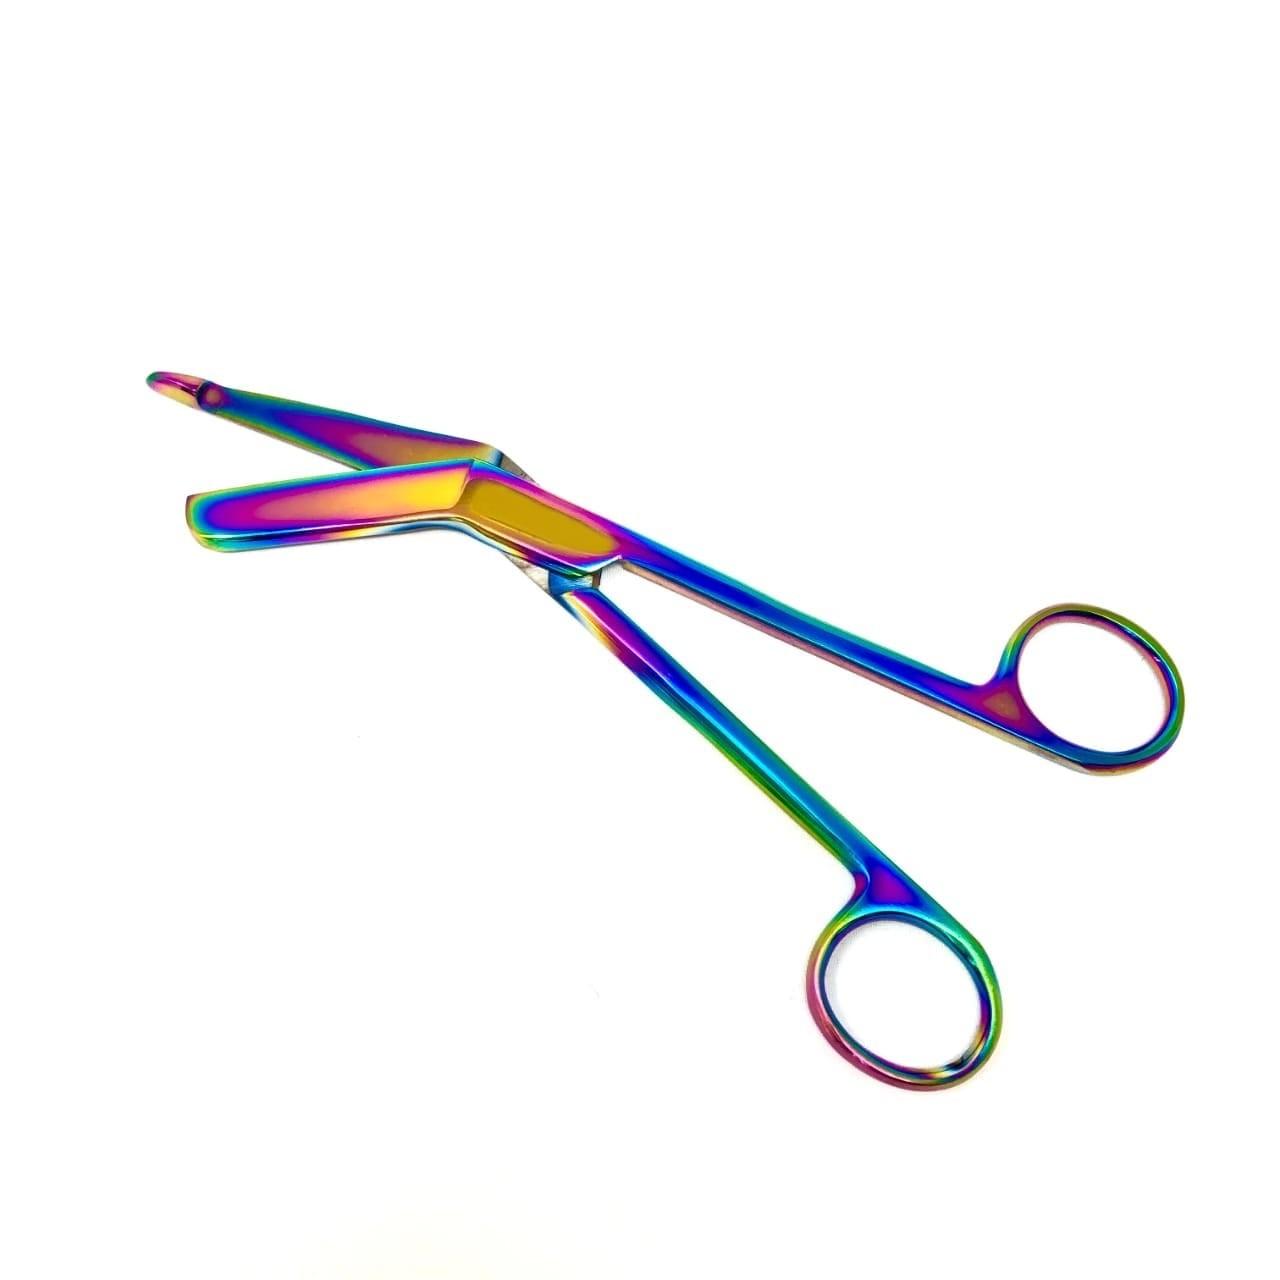 Multicolor Lister Bandage Scissors